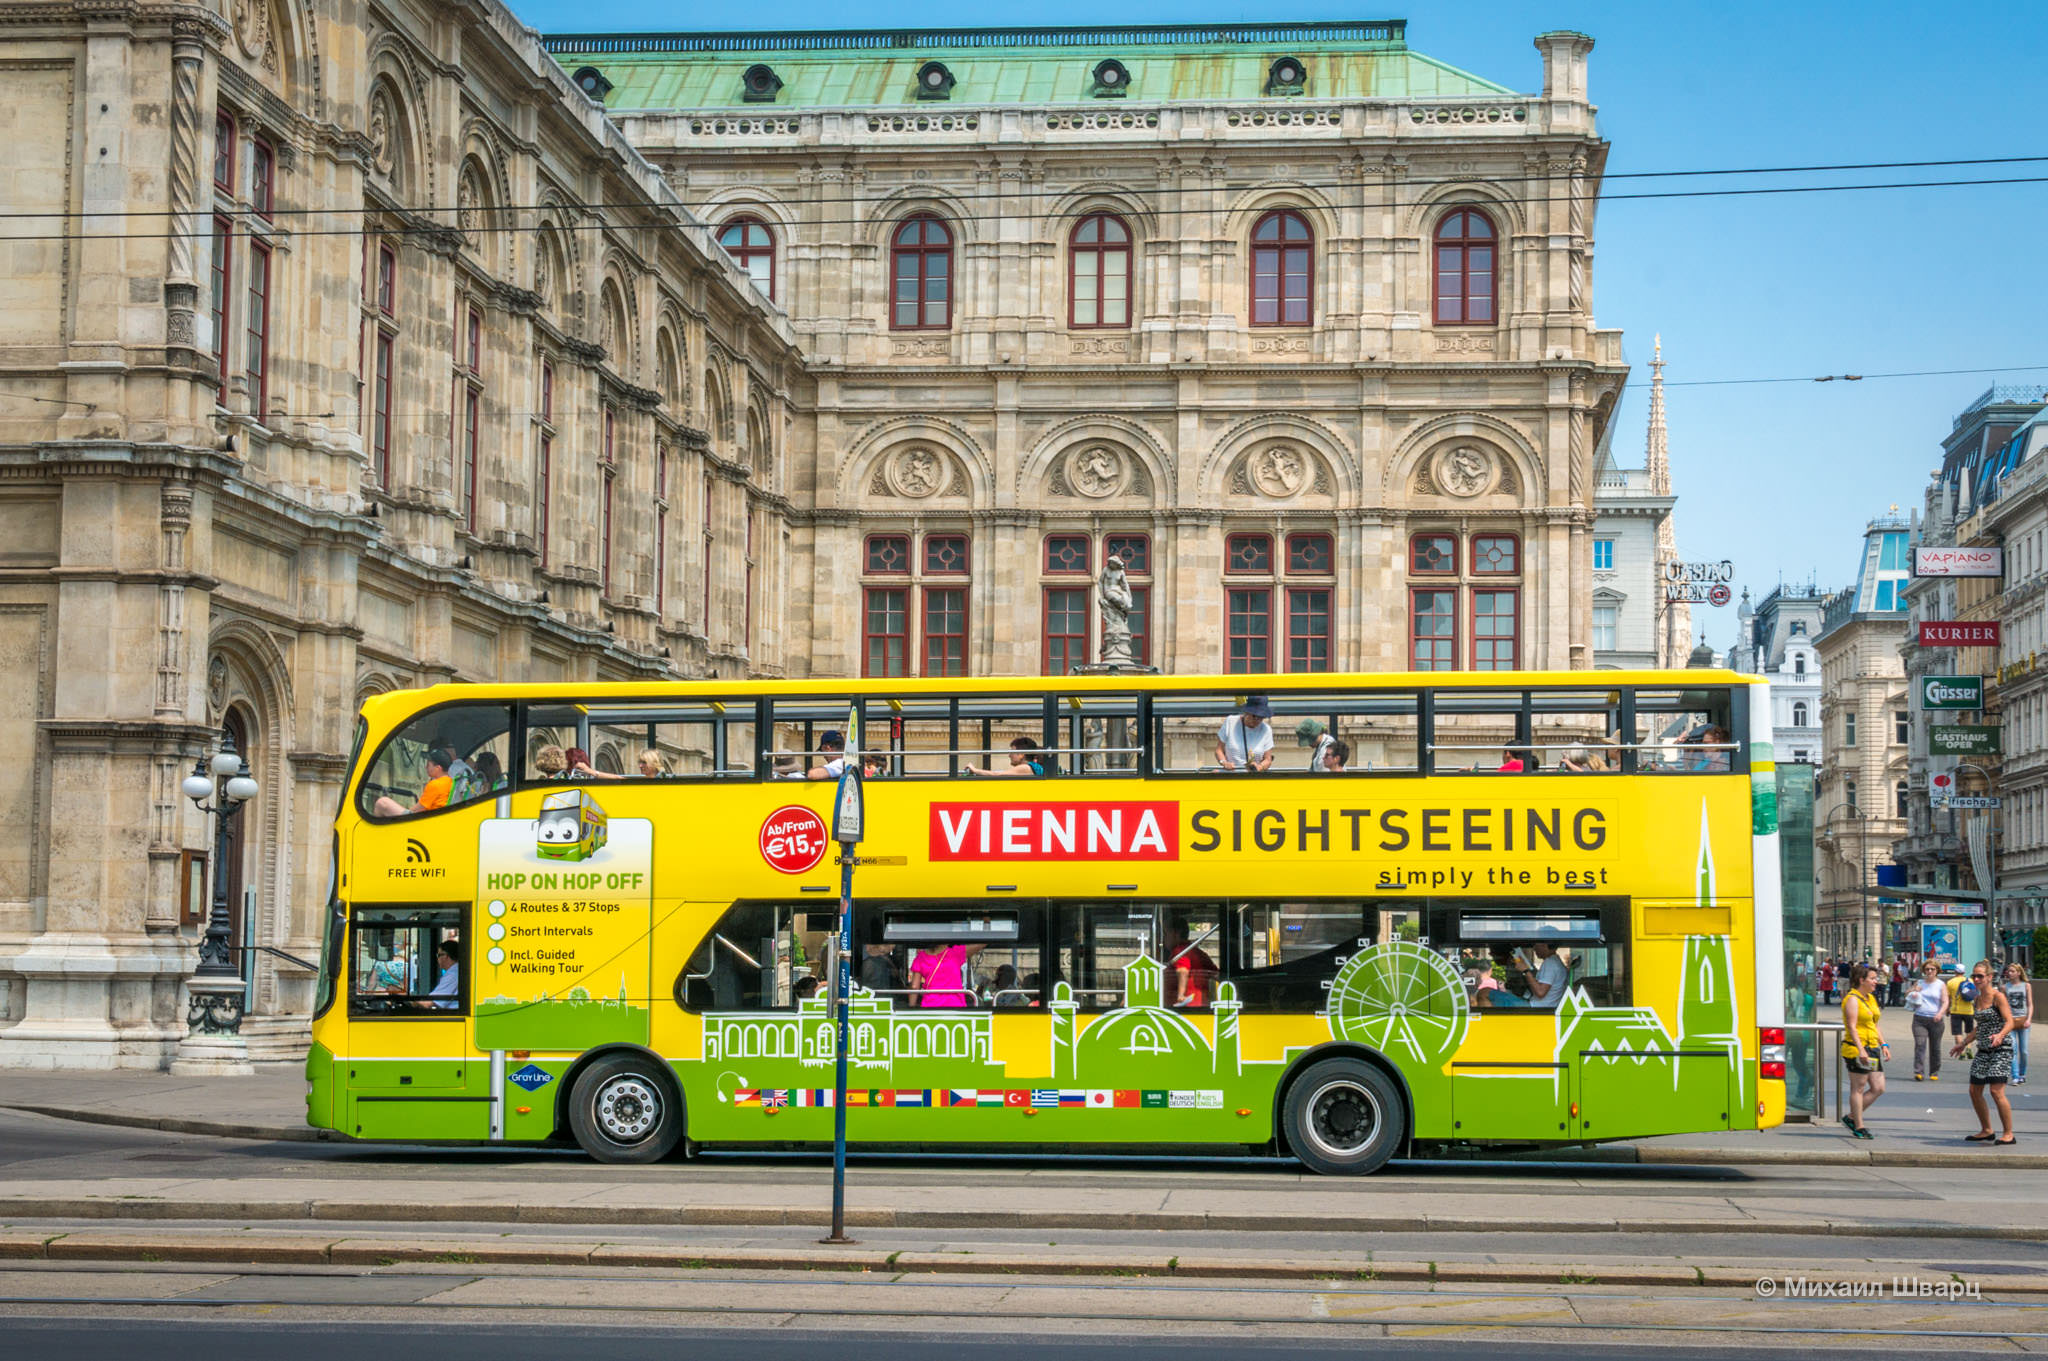 15 советов туристам в вене путеводитель от михаила шварца